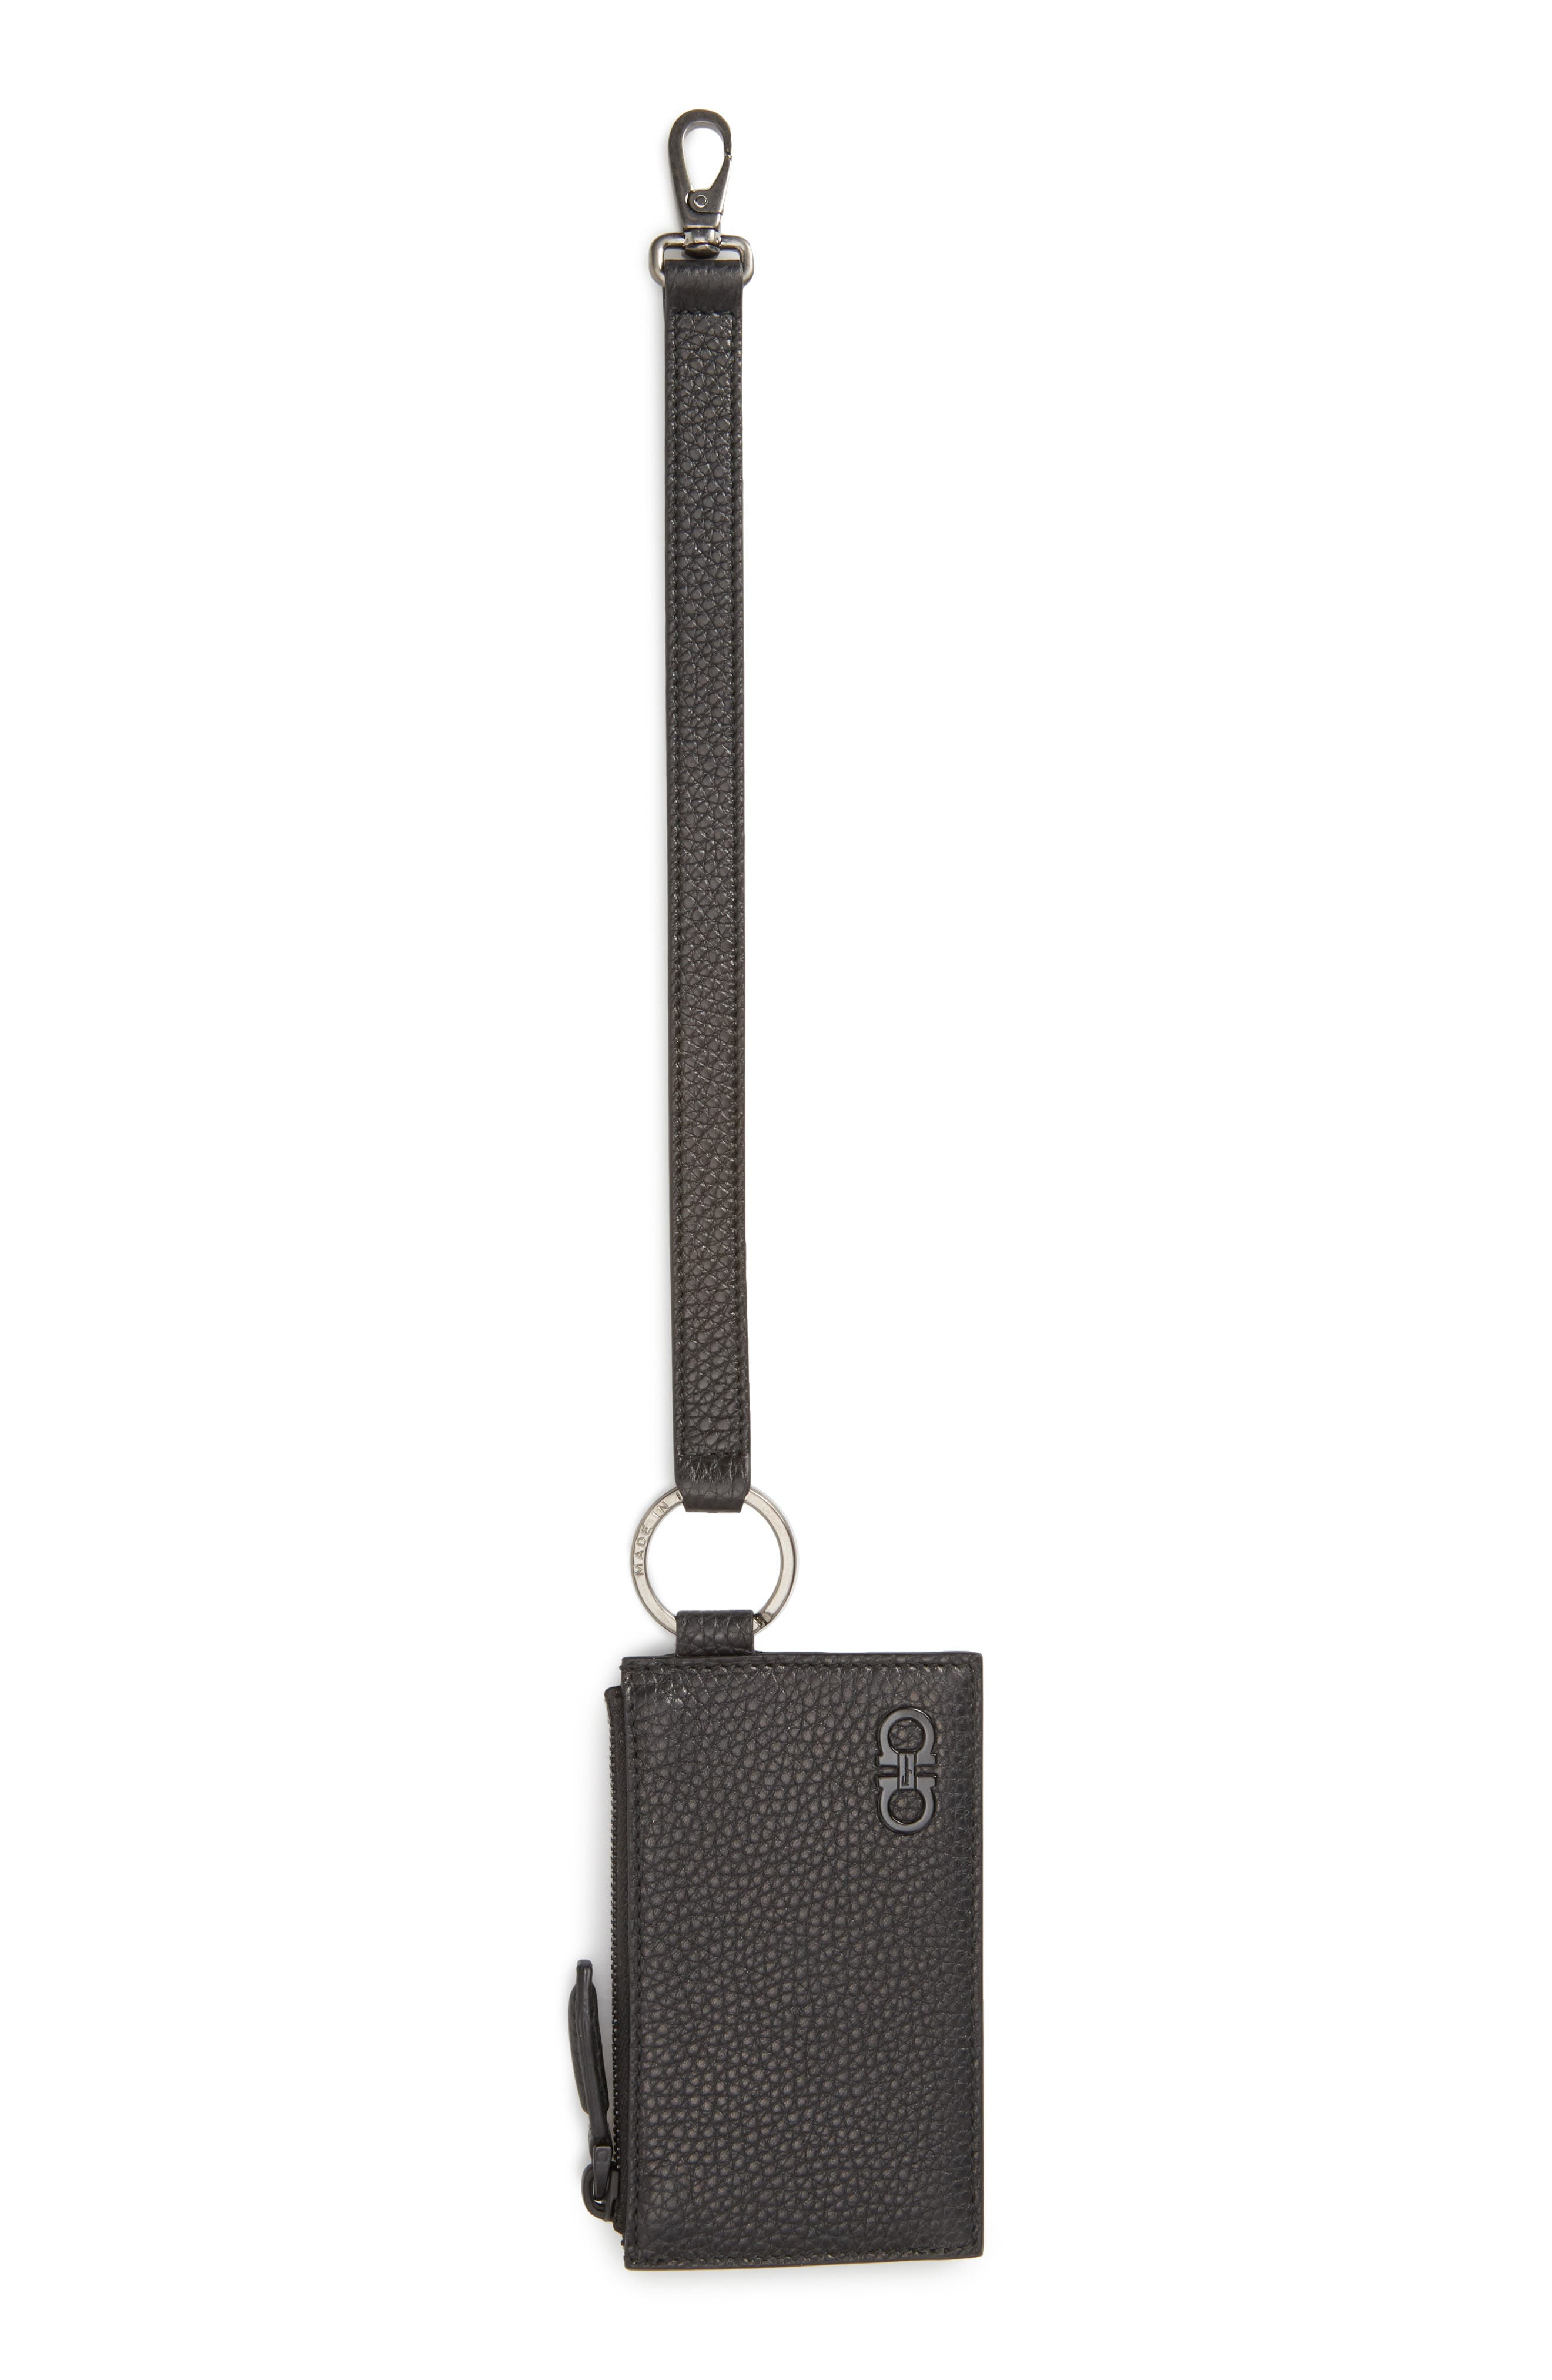 Main Image - Salvatore Ferragamo Leather Zip Wallet with Strap